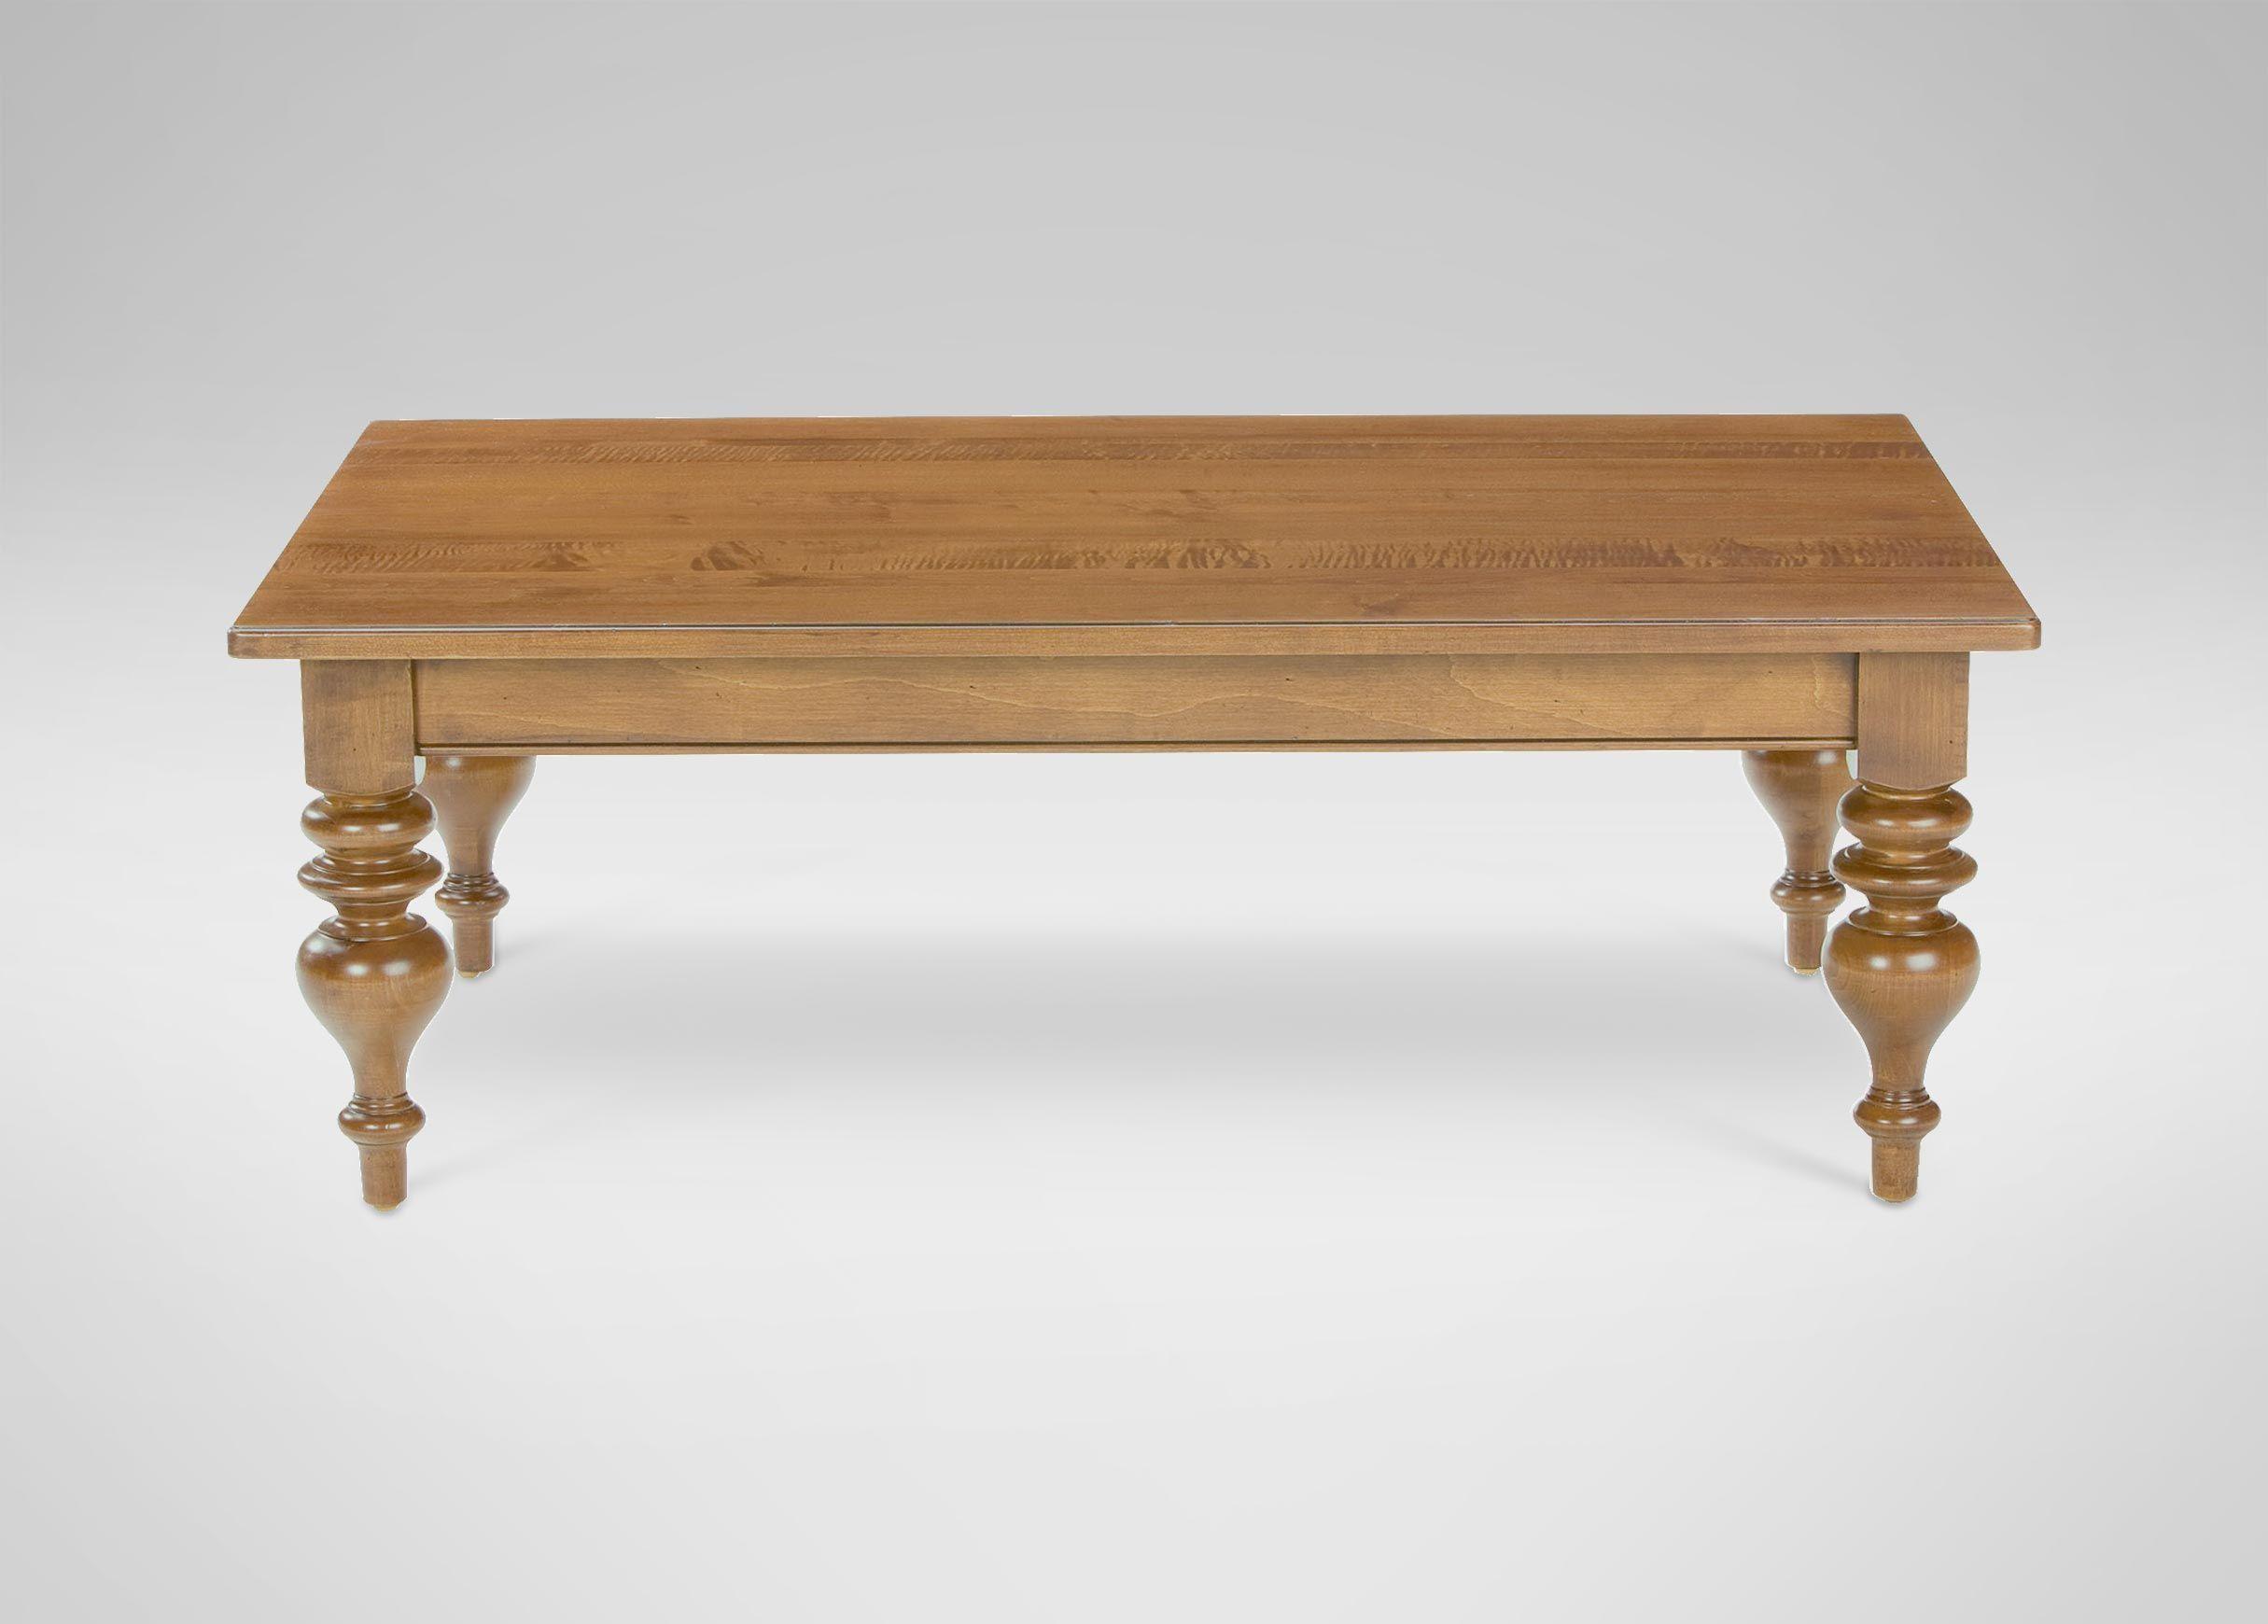 Turner Rectangular Coffee Table Ethan Allen Coffee Table